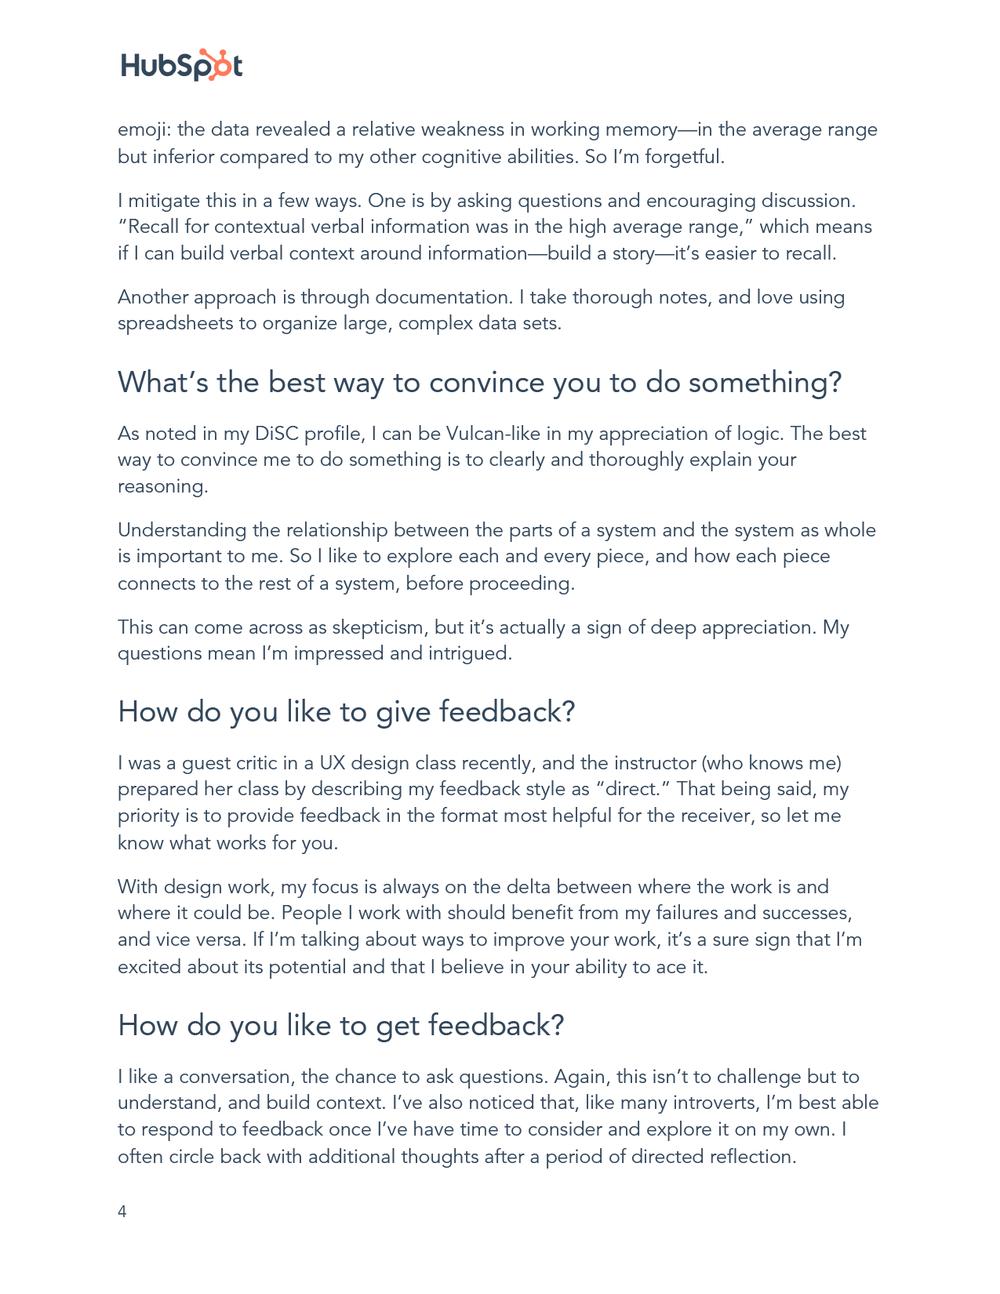 Ben Spear _ Marketing Team User Guide-4.png